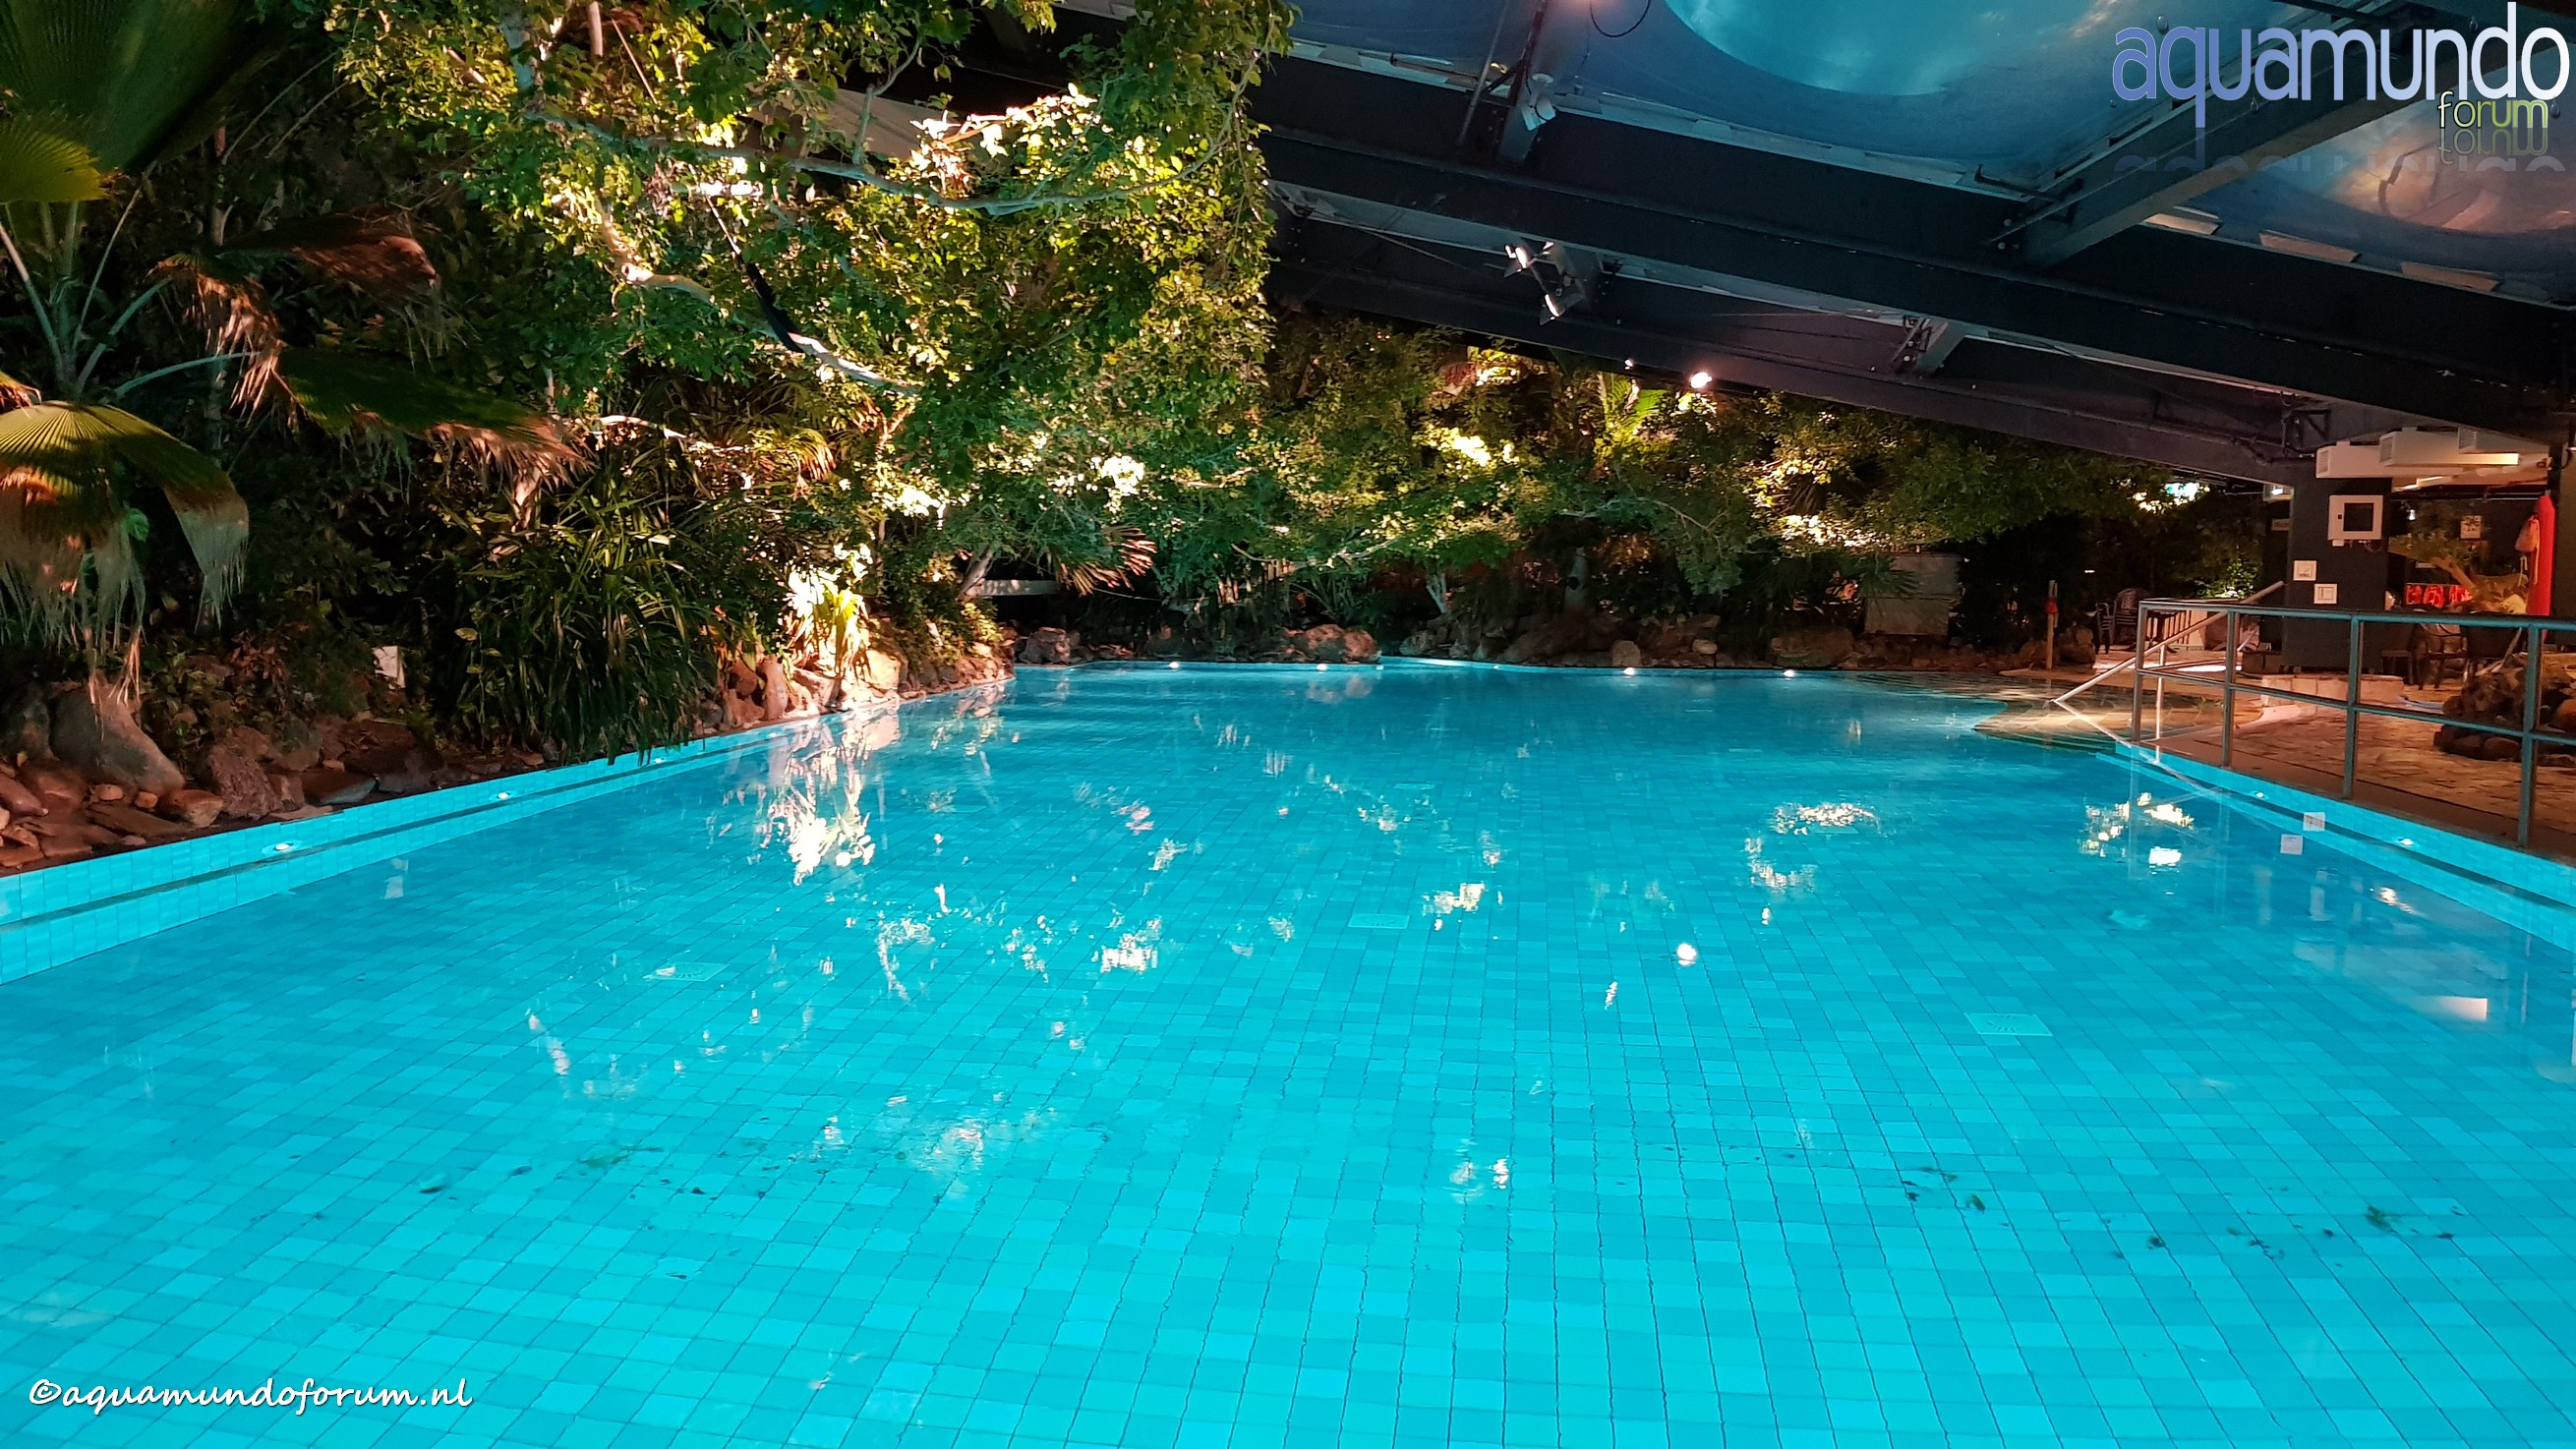 25 meterbad op Center Parcs De Huttenheugte (3).jpg